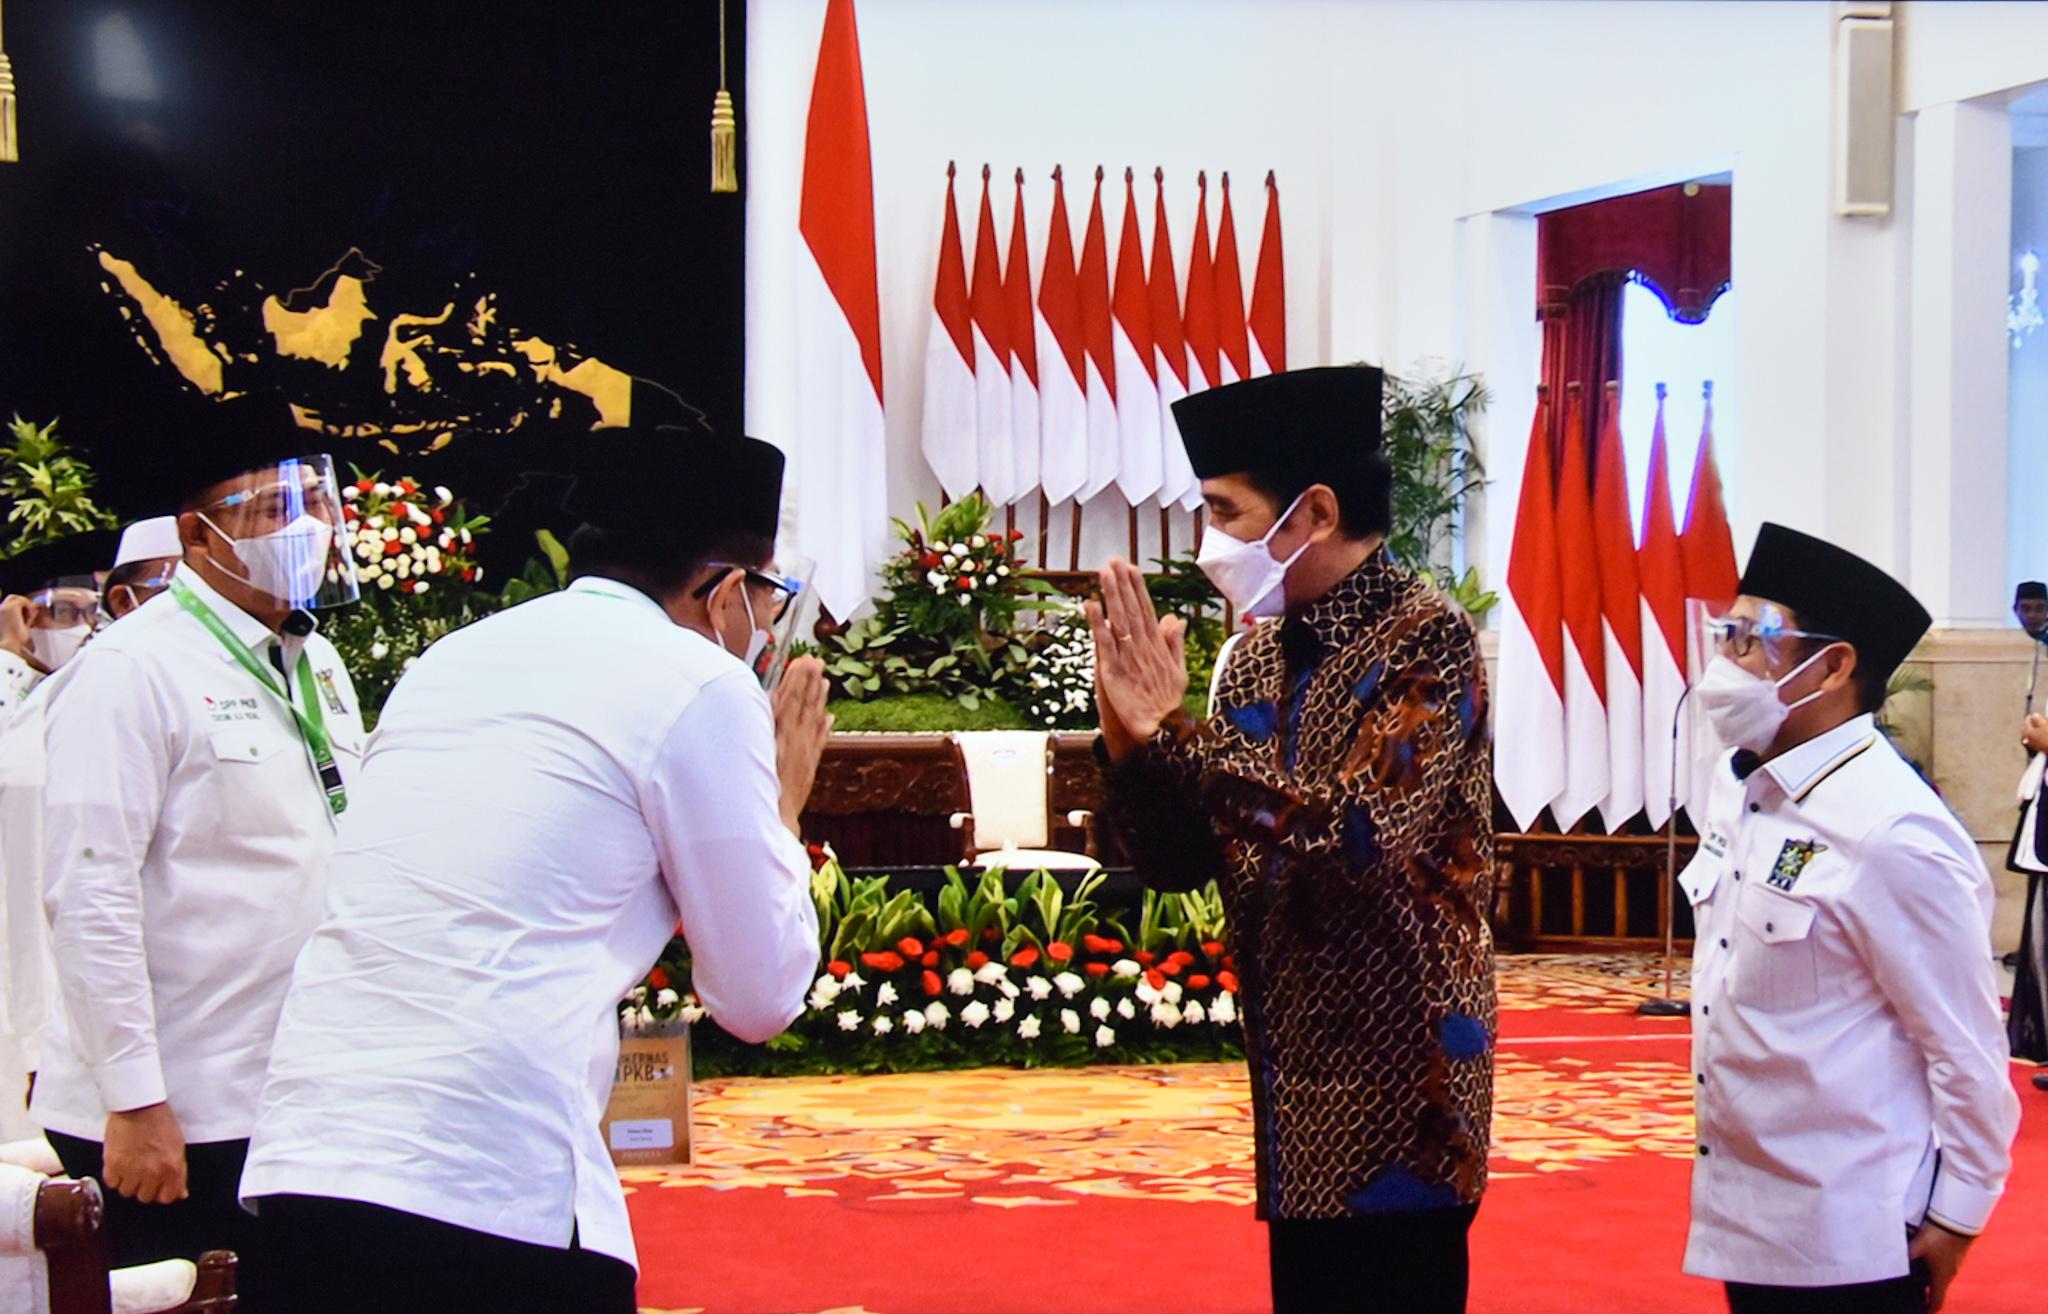 Jokowi Mukernas dan Munas Alim Ulama PKB